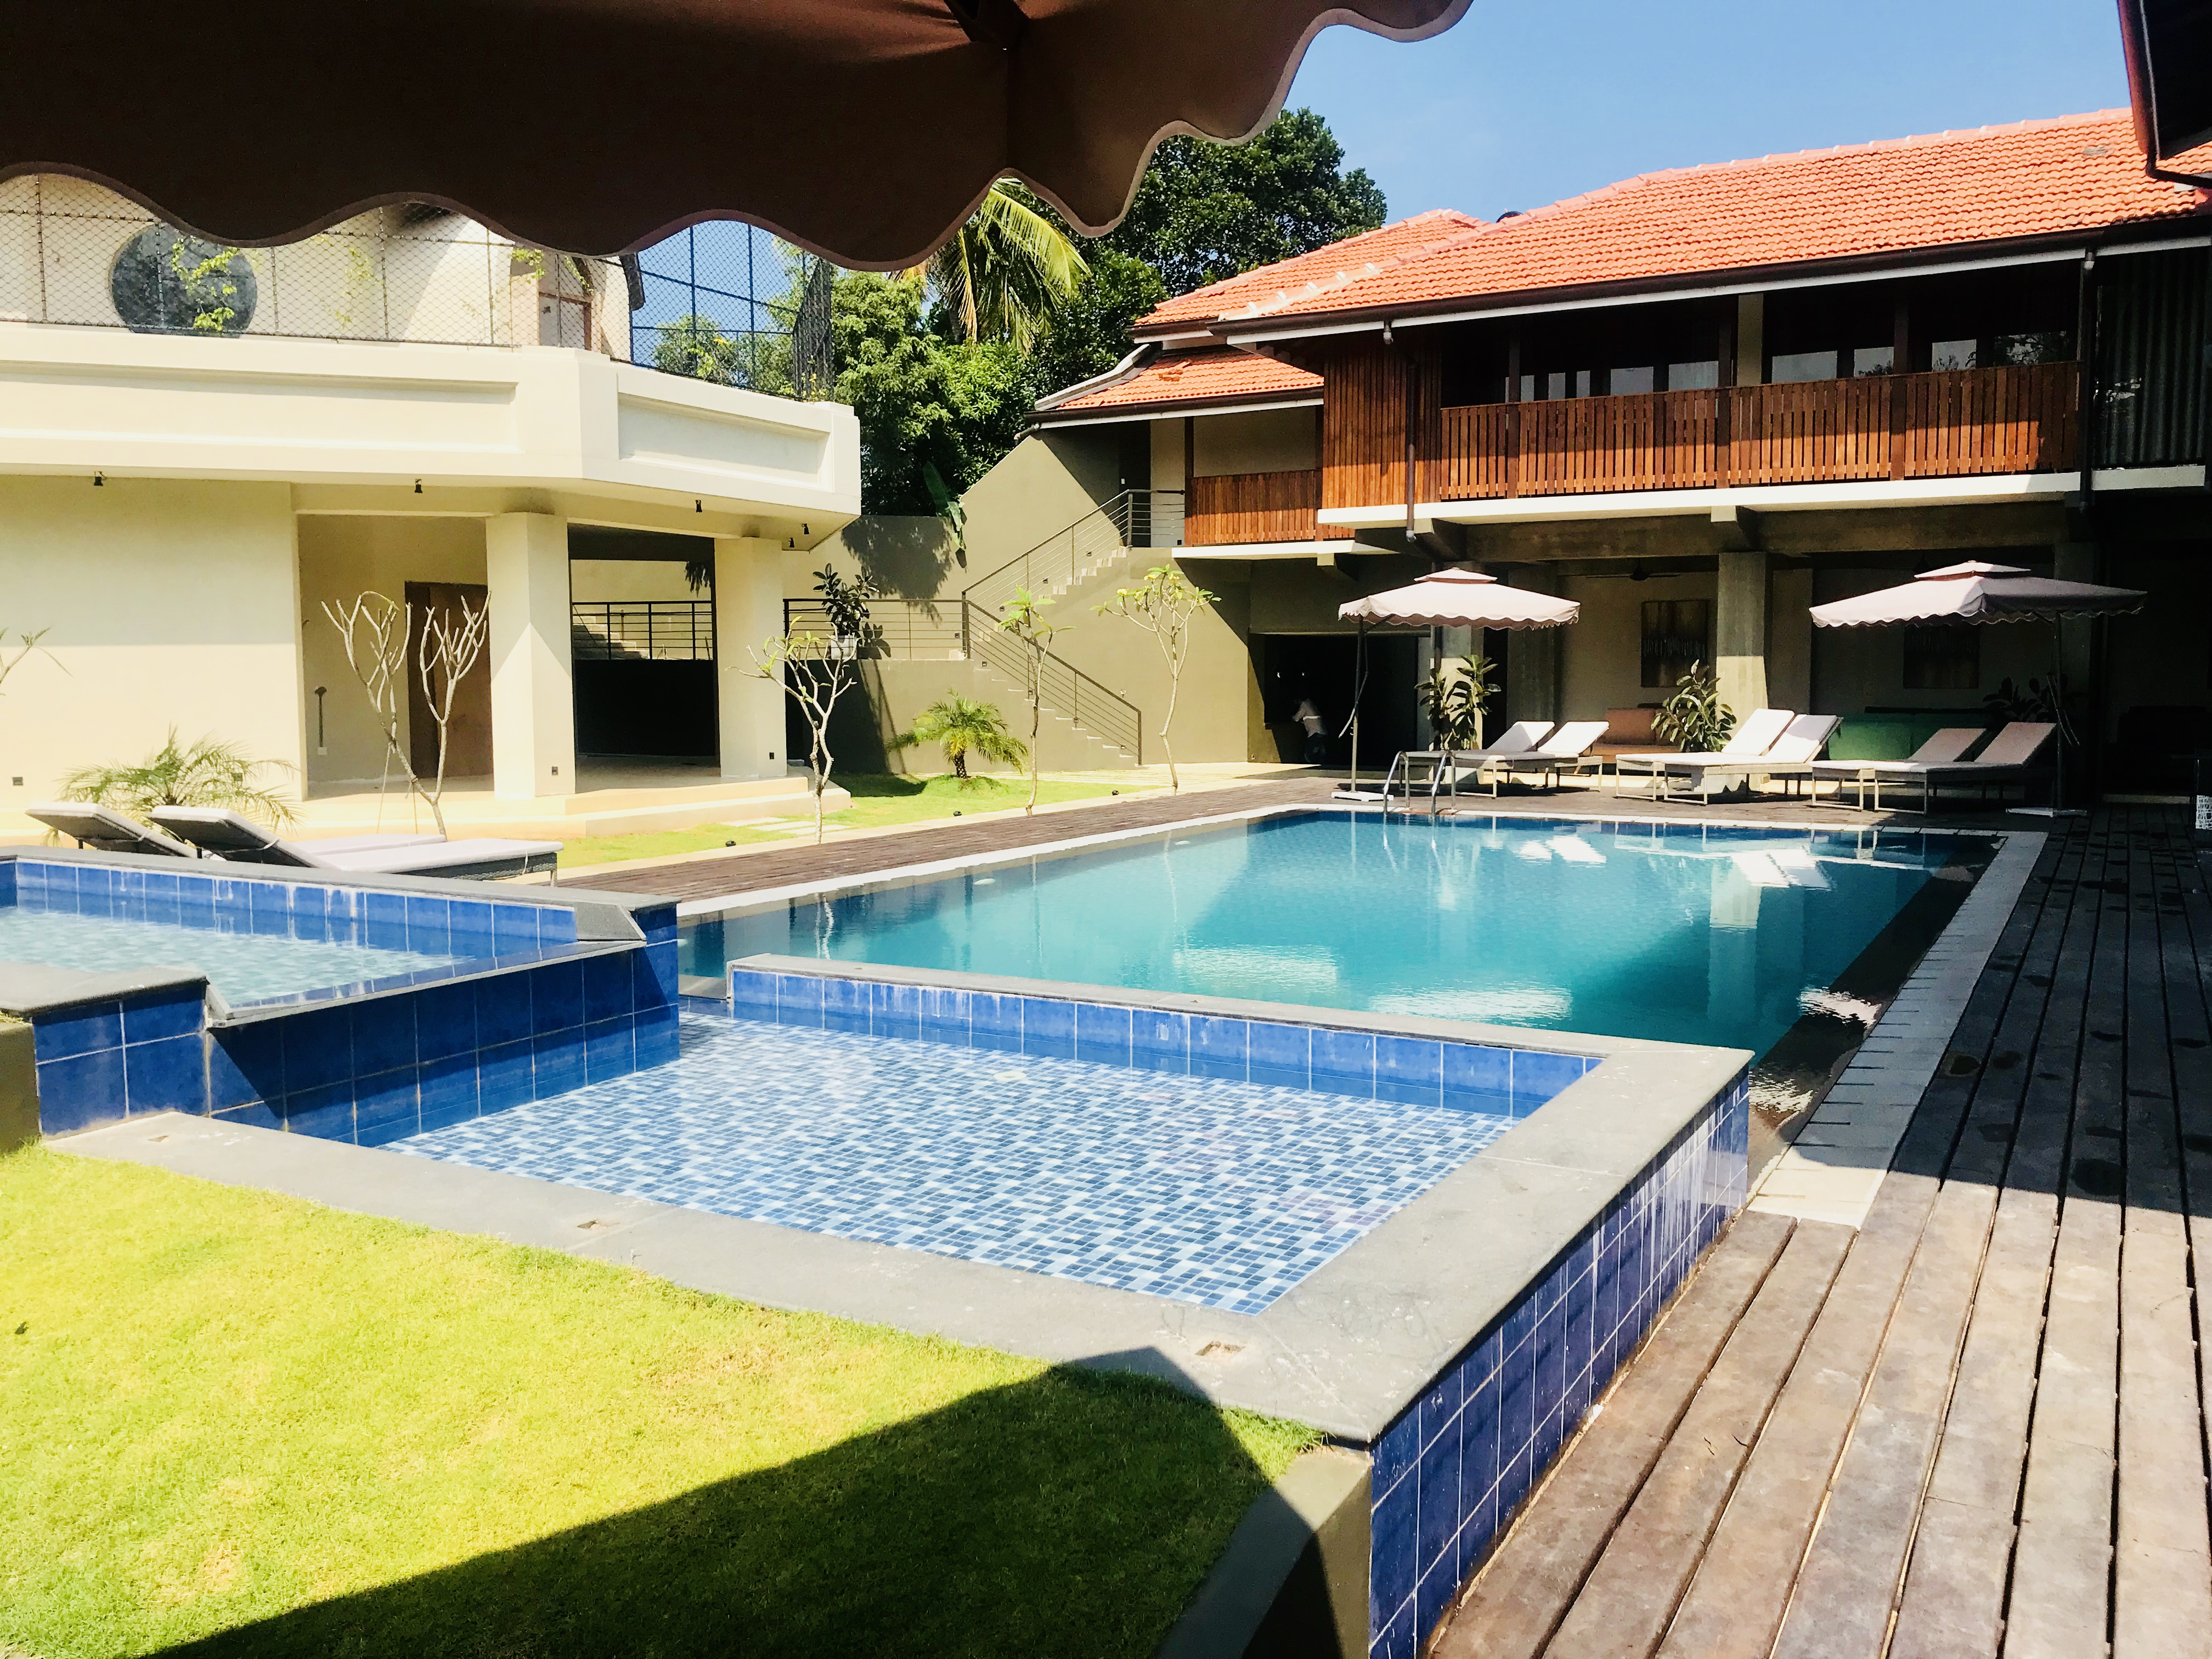 Ceylonlak Boutique Hotel. Negombo, Sri Lanka